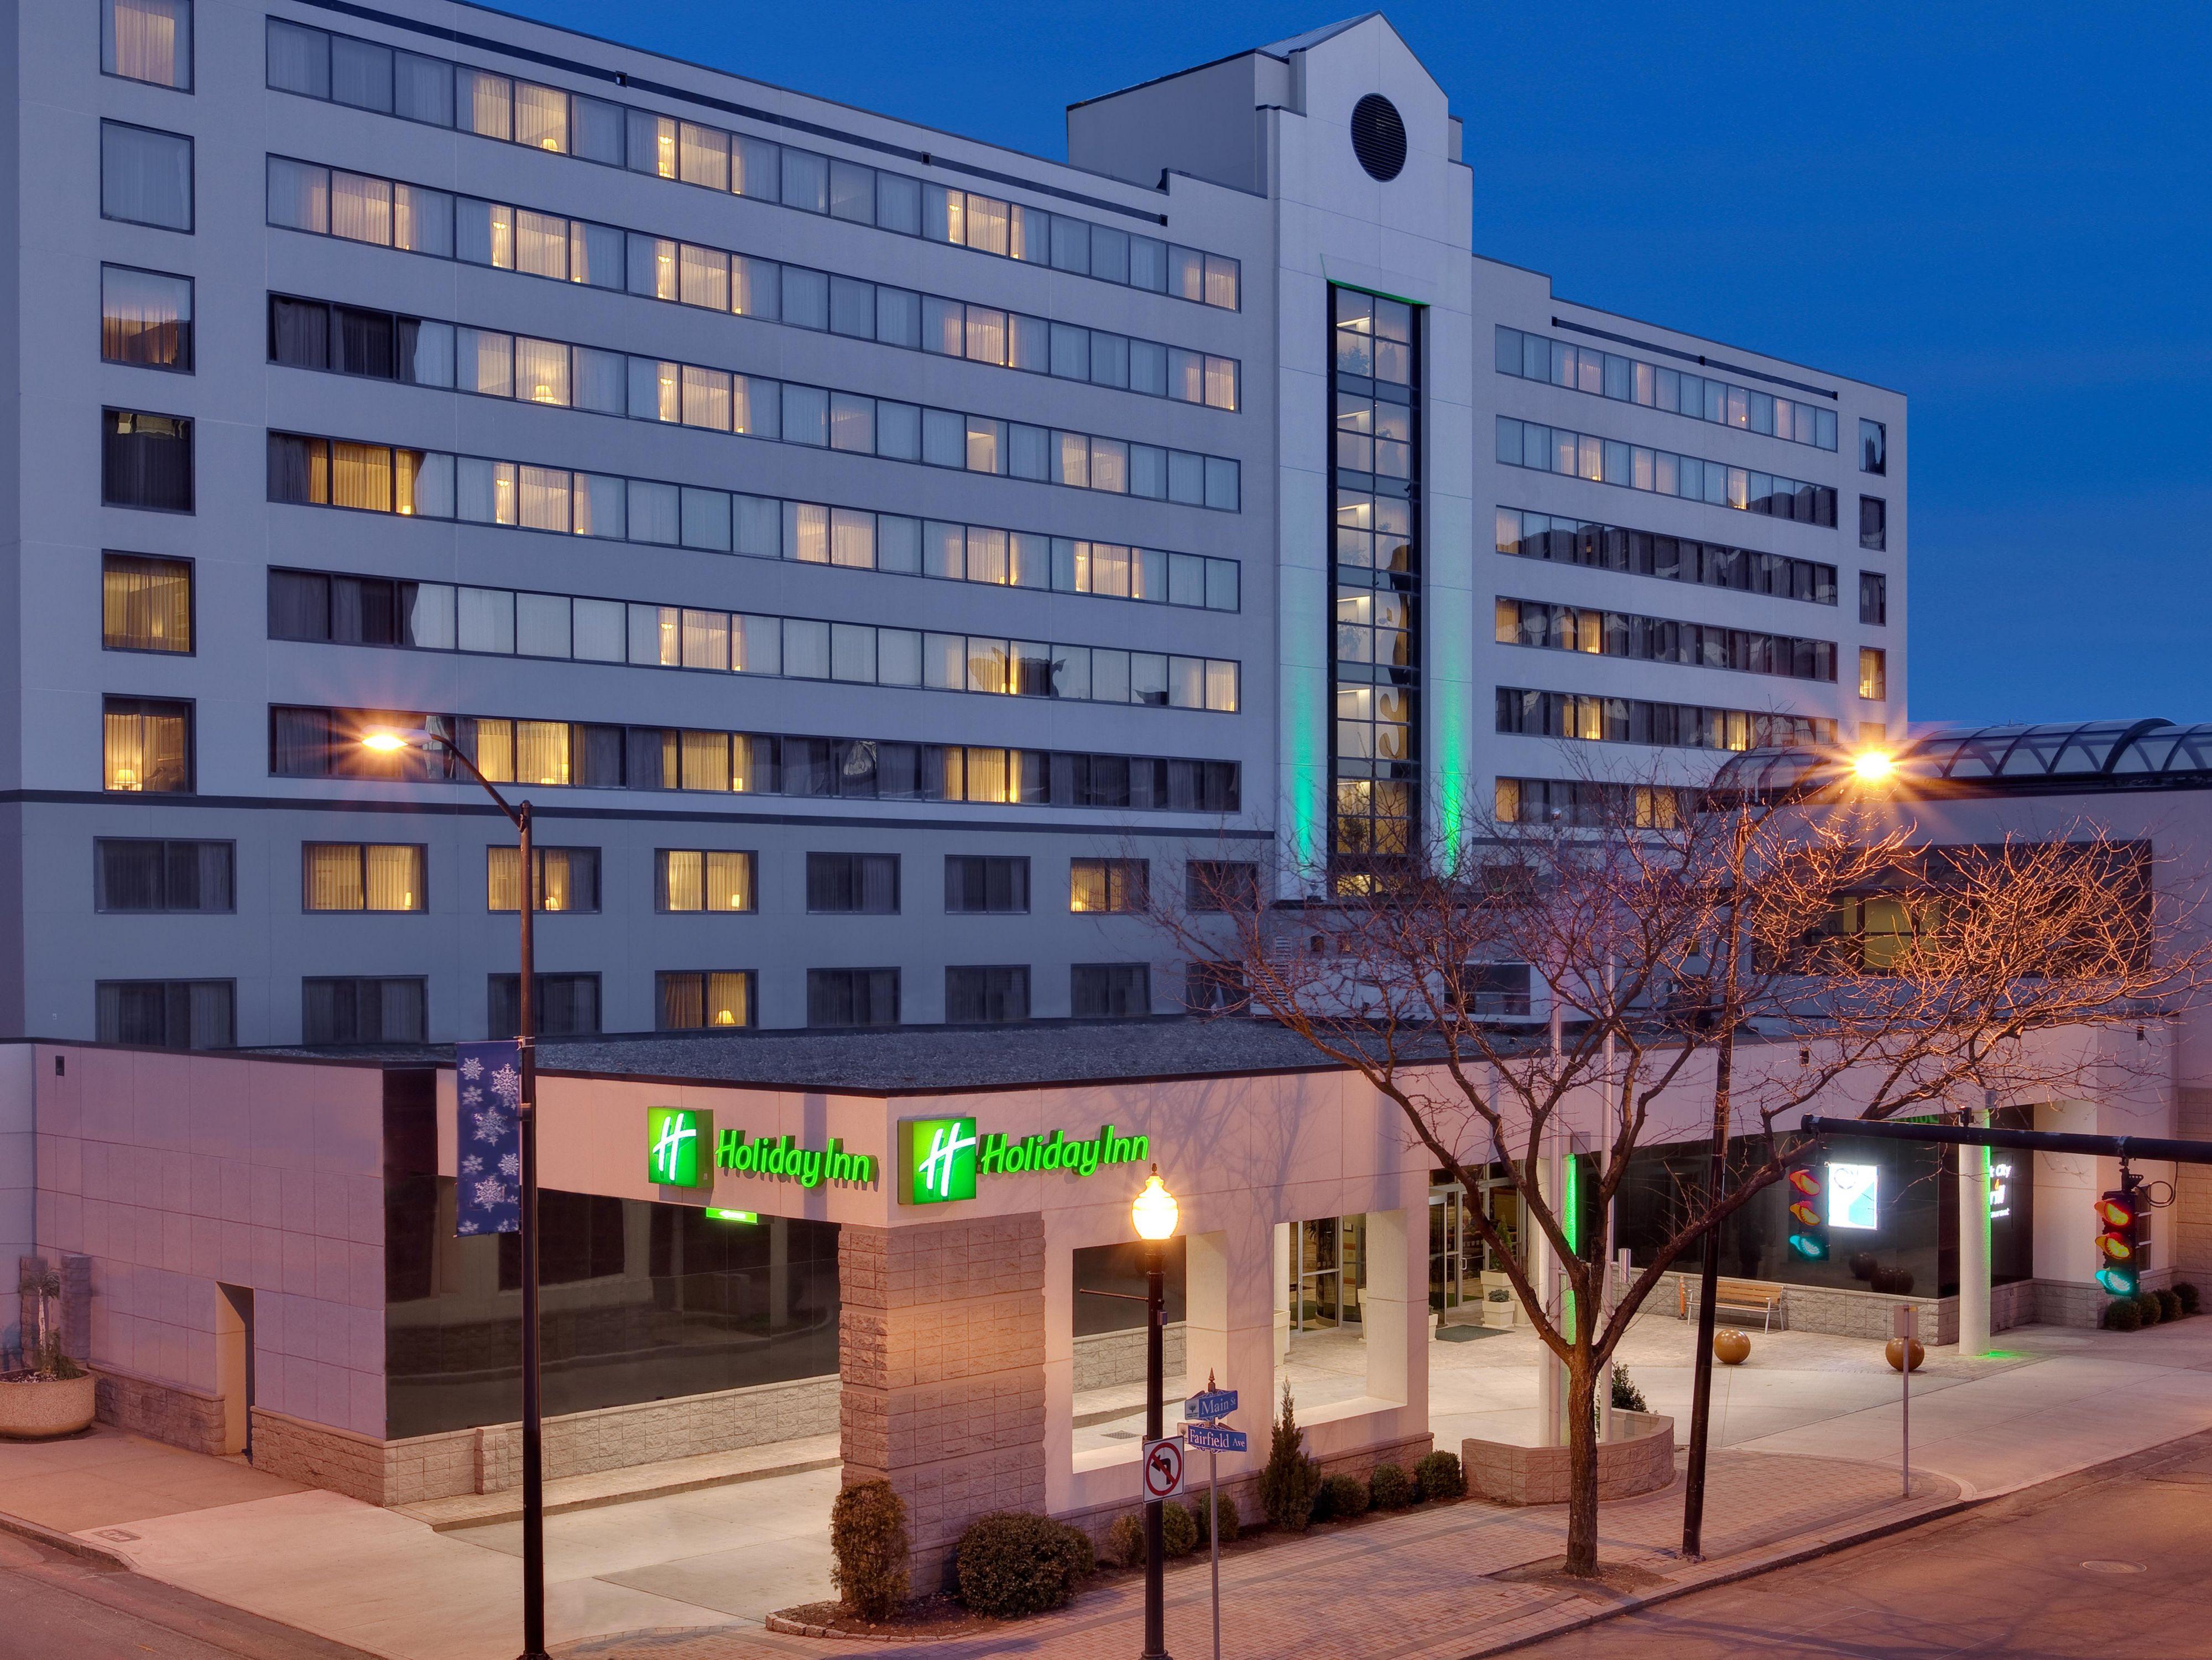 Hungarian Christmas Bridgeport Ct 2020 Hotels in Bridgeport, CT | Holiday Inn Bridgeport Trumbull Fairfield